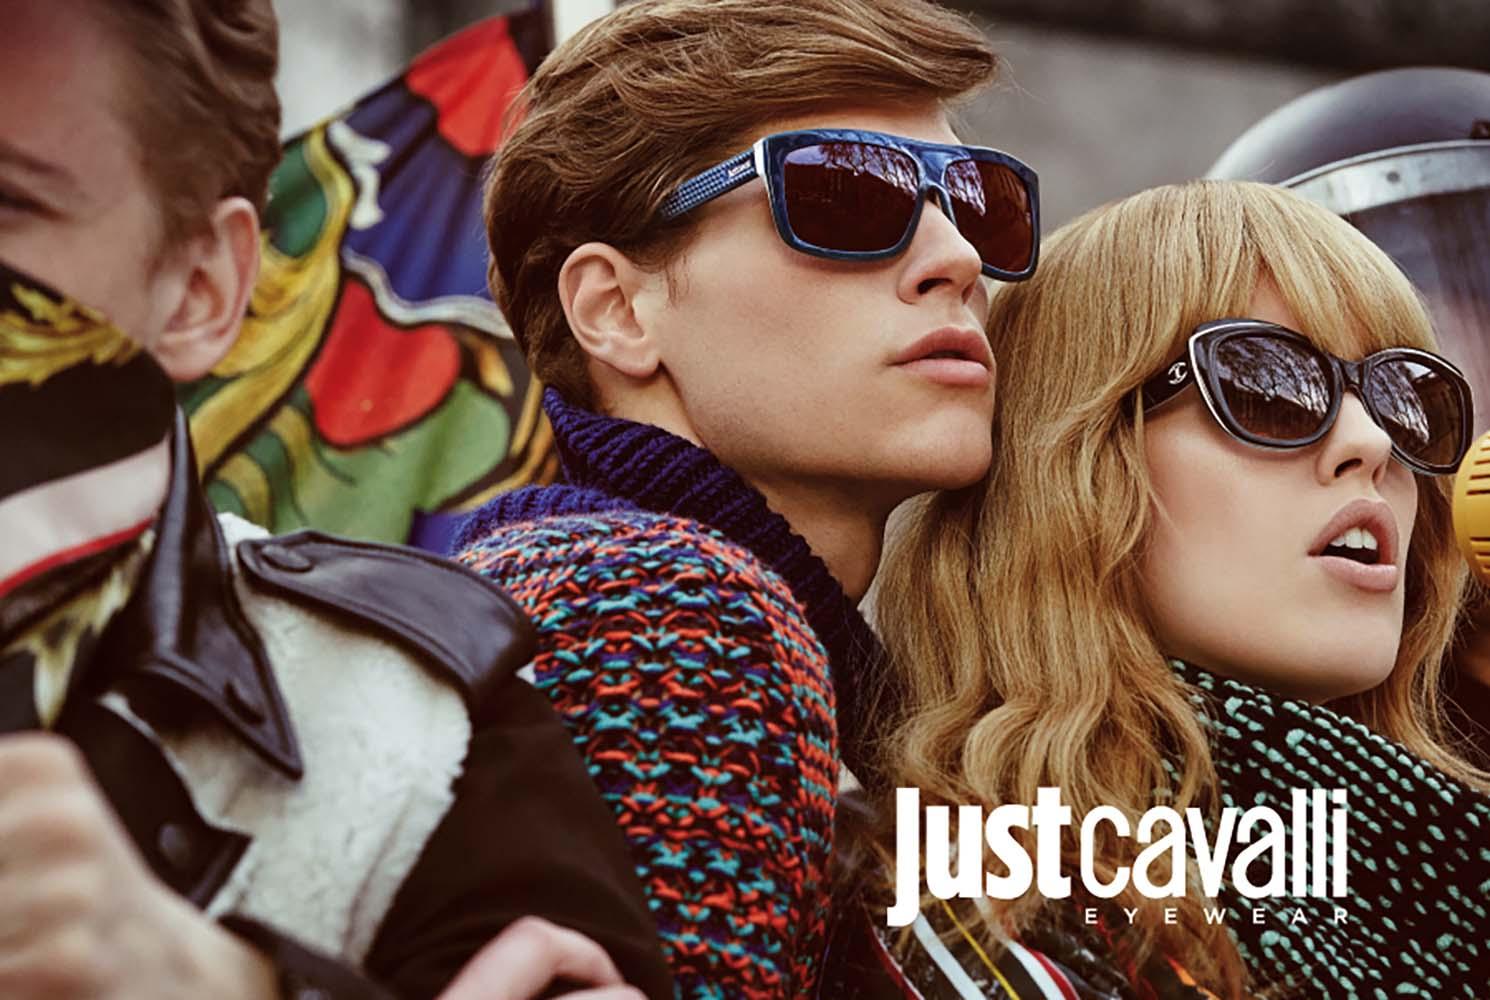 Just Cavalli by Braga + Federico